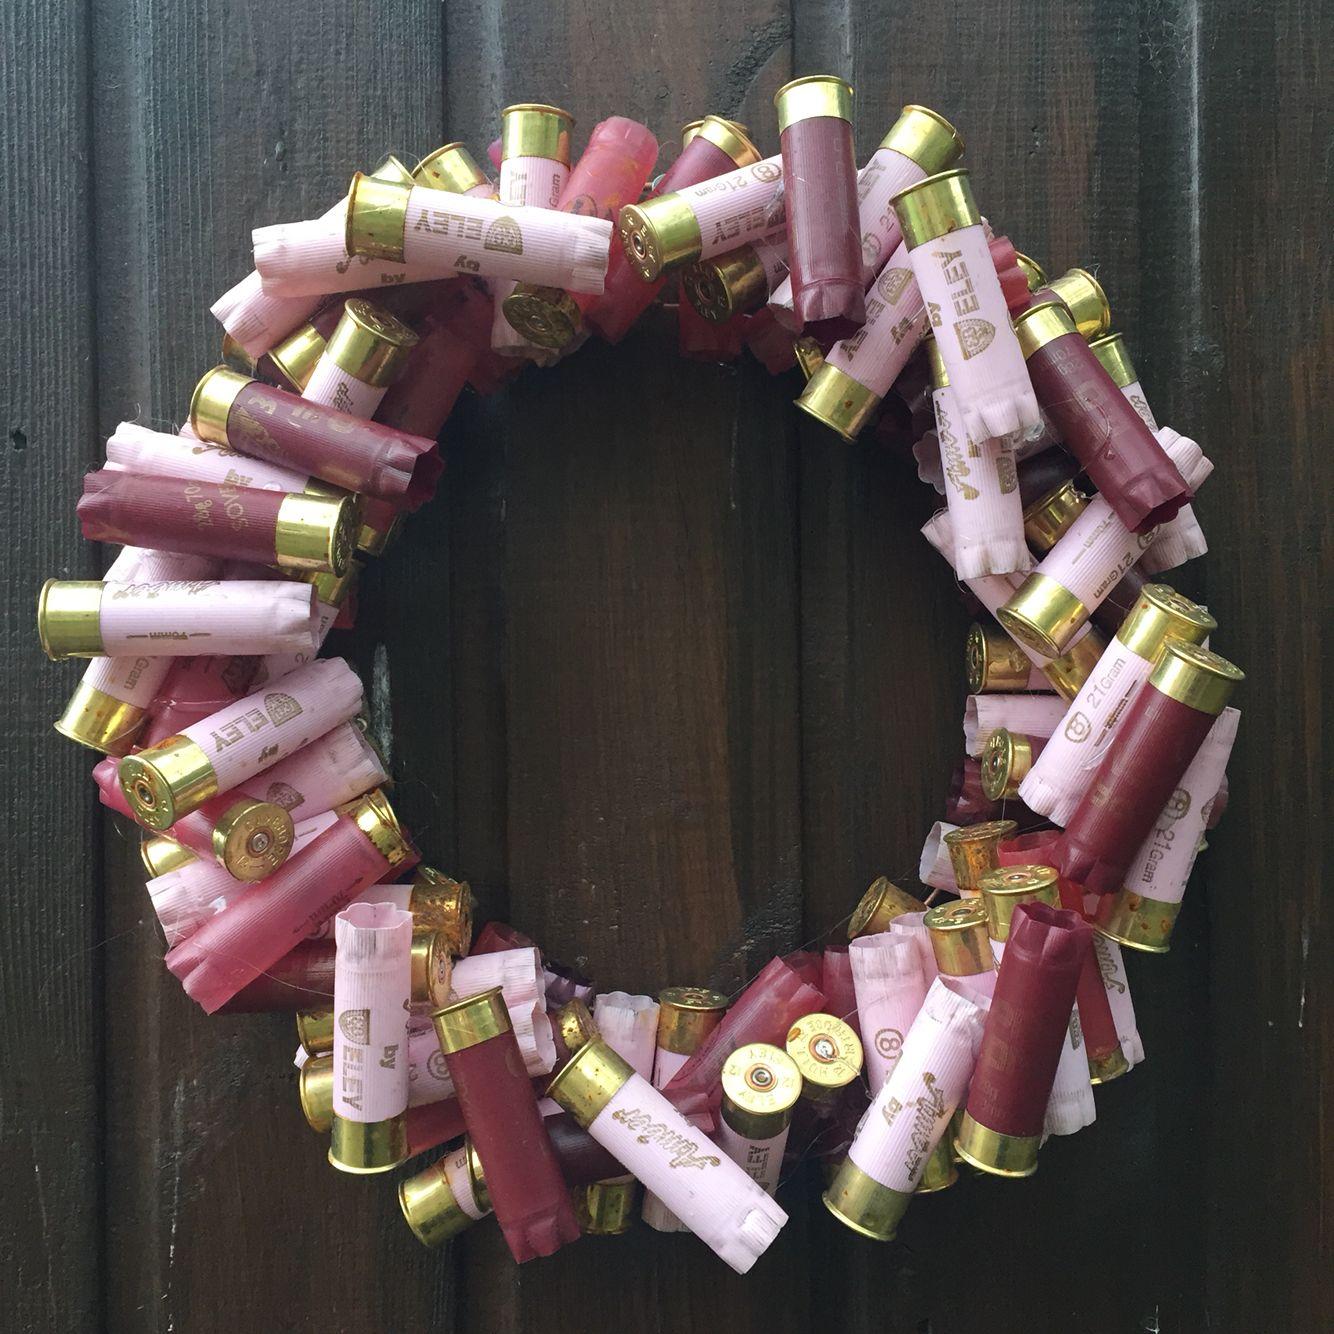 Cartridge wreaths https://m.facebook.com/Made-in-Yorkshire-955620381177778/